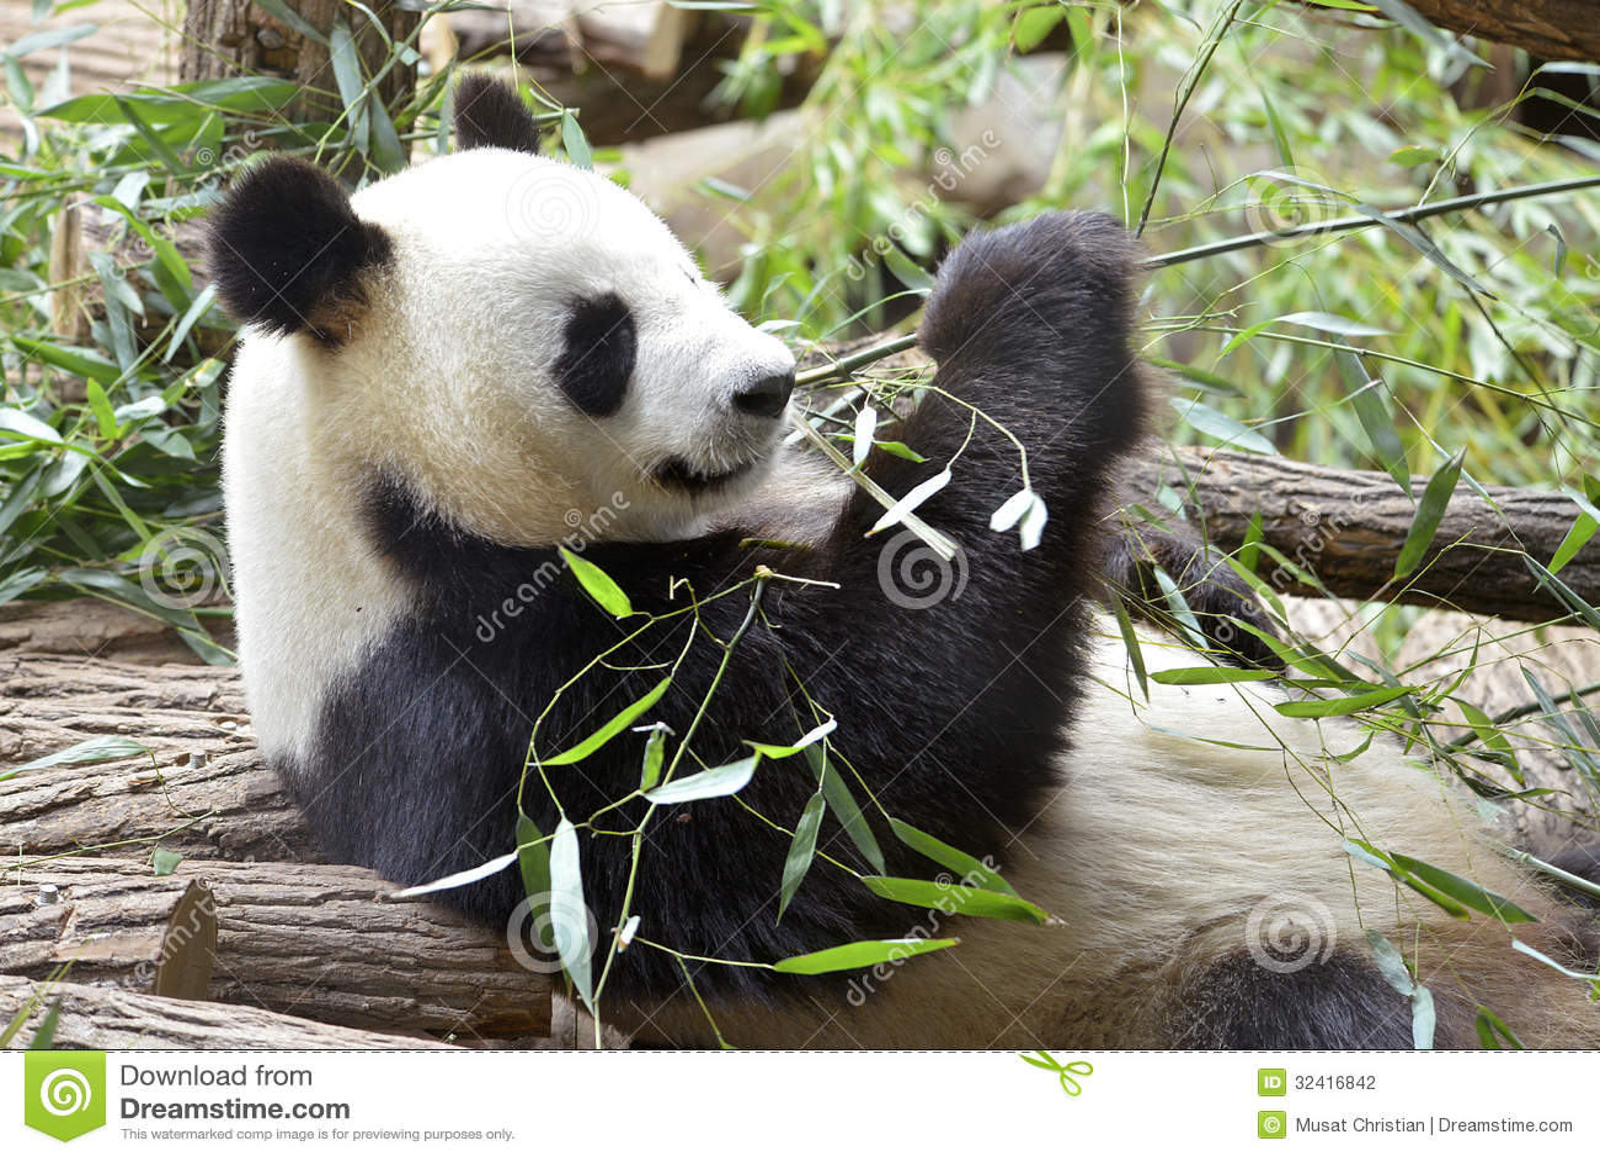 Giant Panda Eating Bamboo Stock Photography Image 32416842